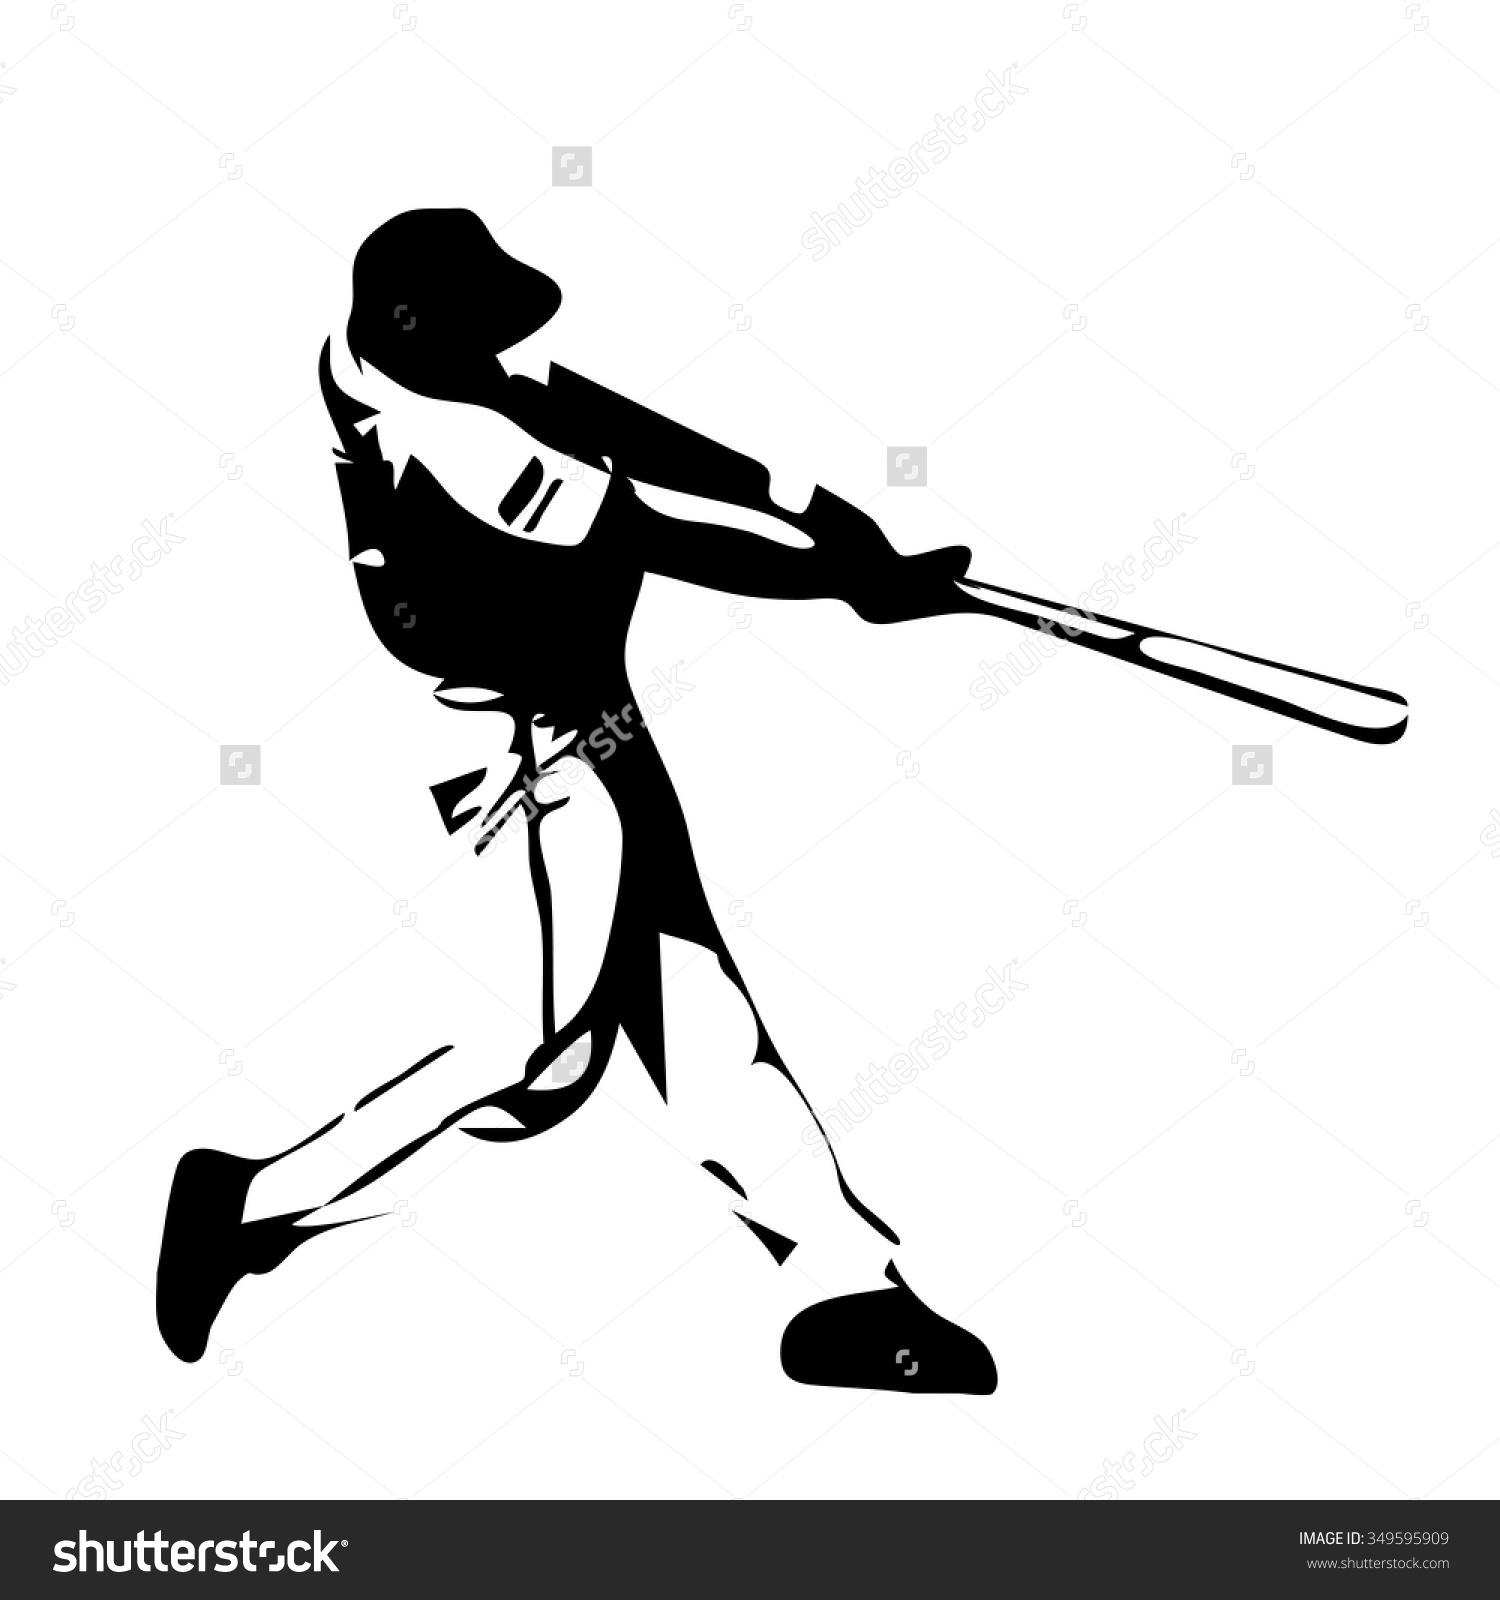 1500x1600 Clip Art Baseball Player Swinging Bat Clip Art